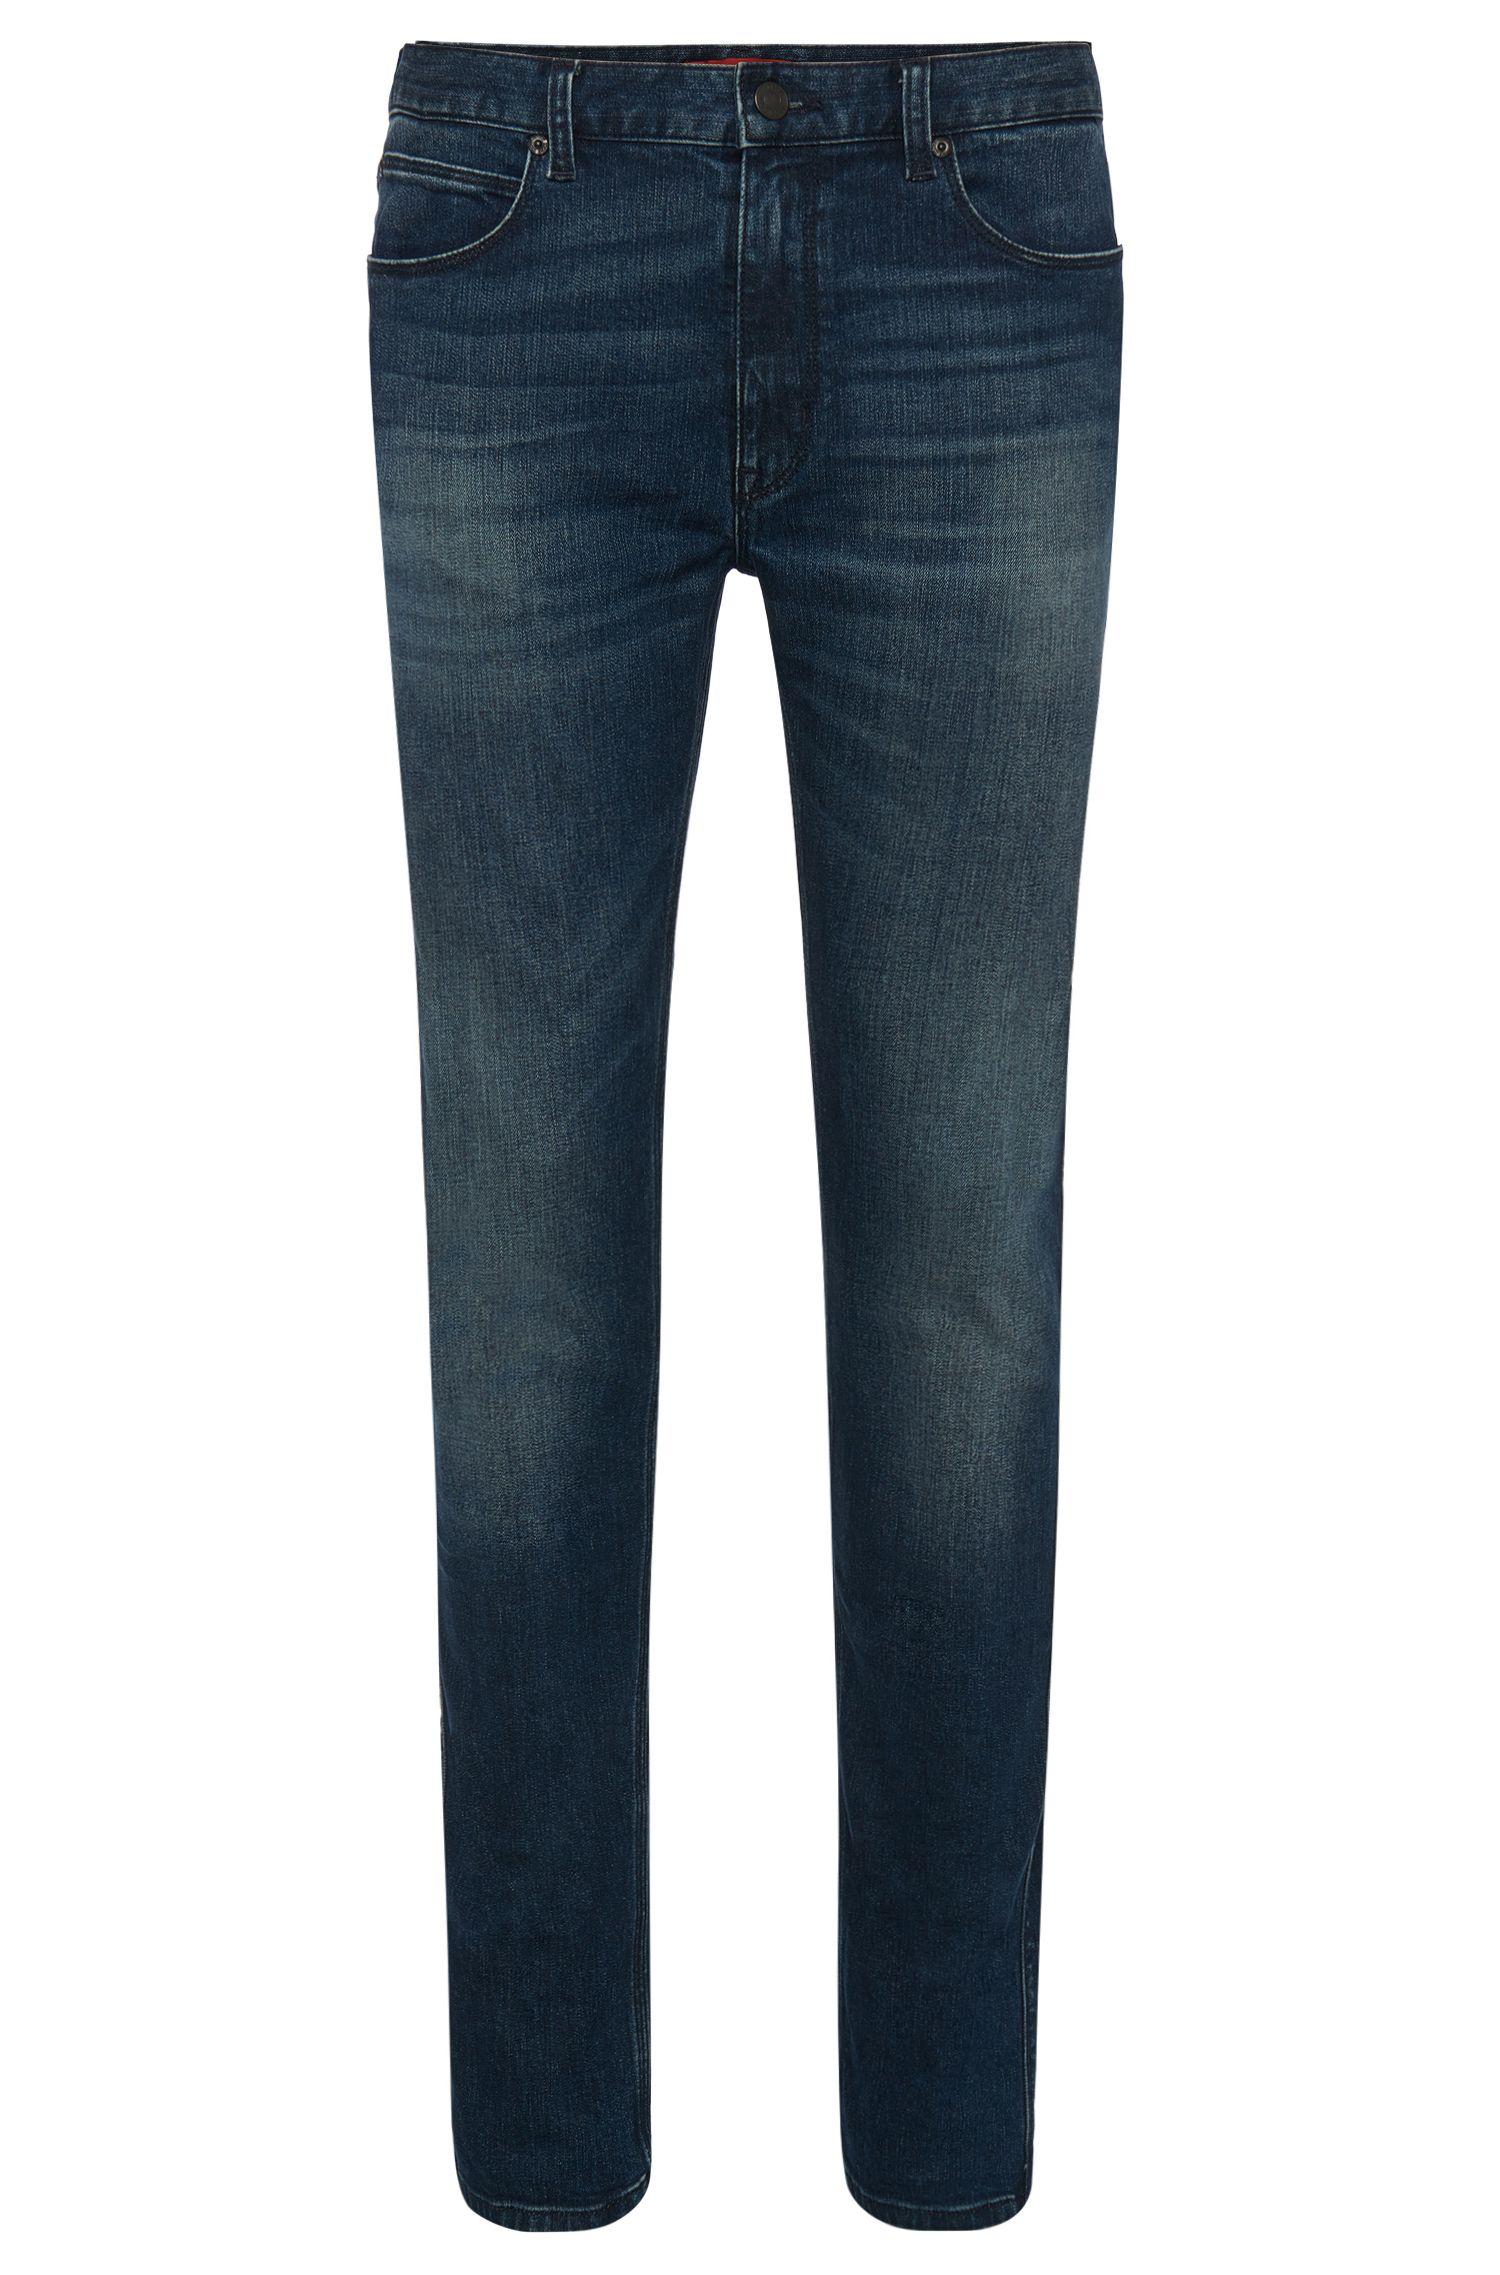 'HUGO 734' | Skinny Fit, 12.5 oz Stretch Cotton Jeans